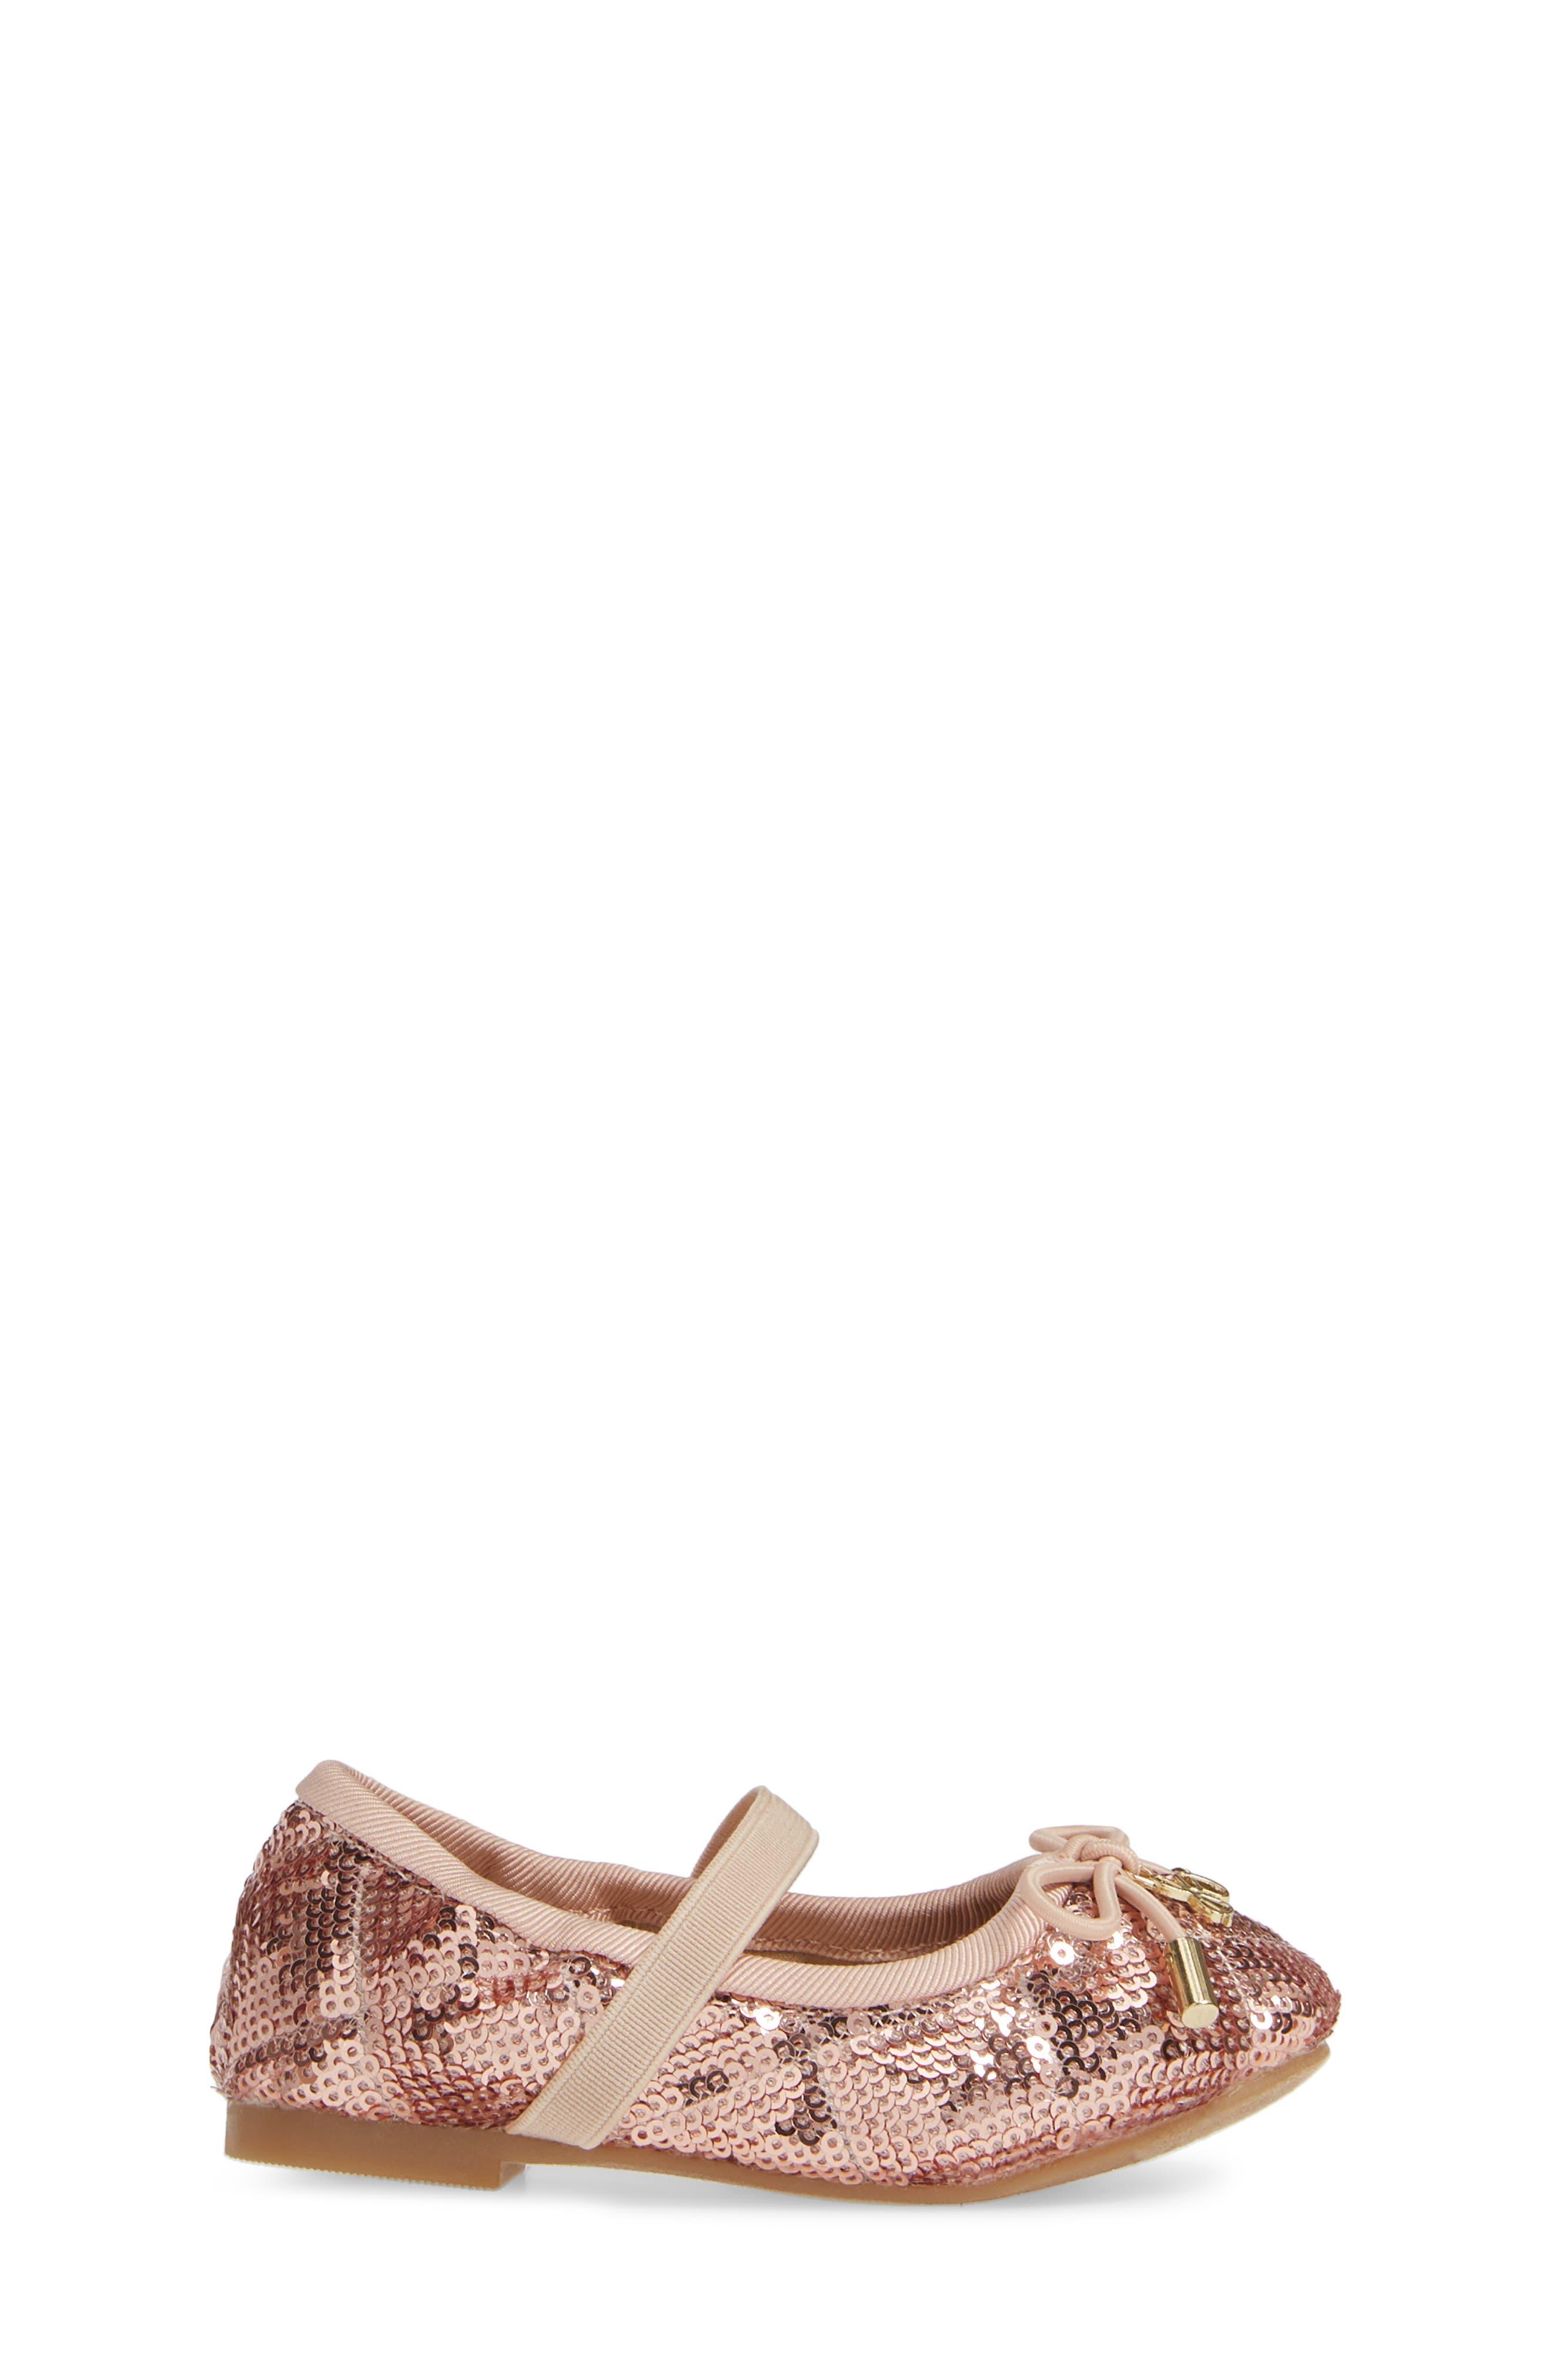 SAM EDELMAN, 'Felicia' Mary Jane Ballet Flat, Alternate thumbnail 3, color, ROSE GOLD